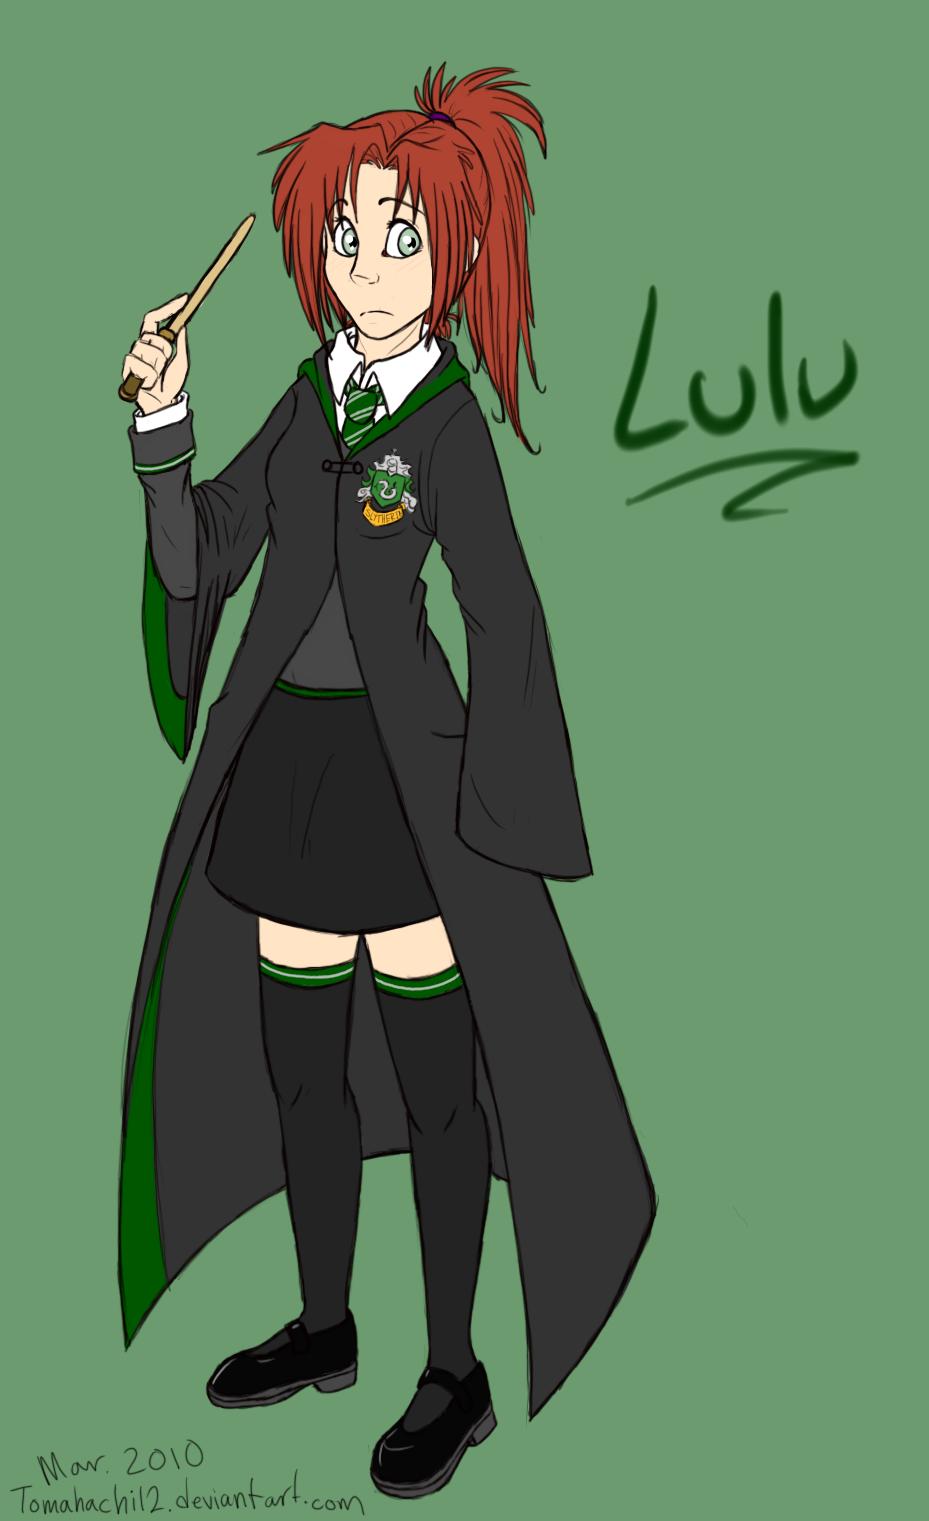 Harry Potter OC: Lulu by tomahachi12 on DeviantArt